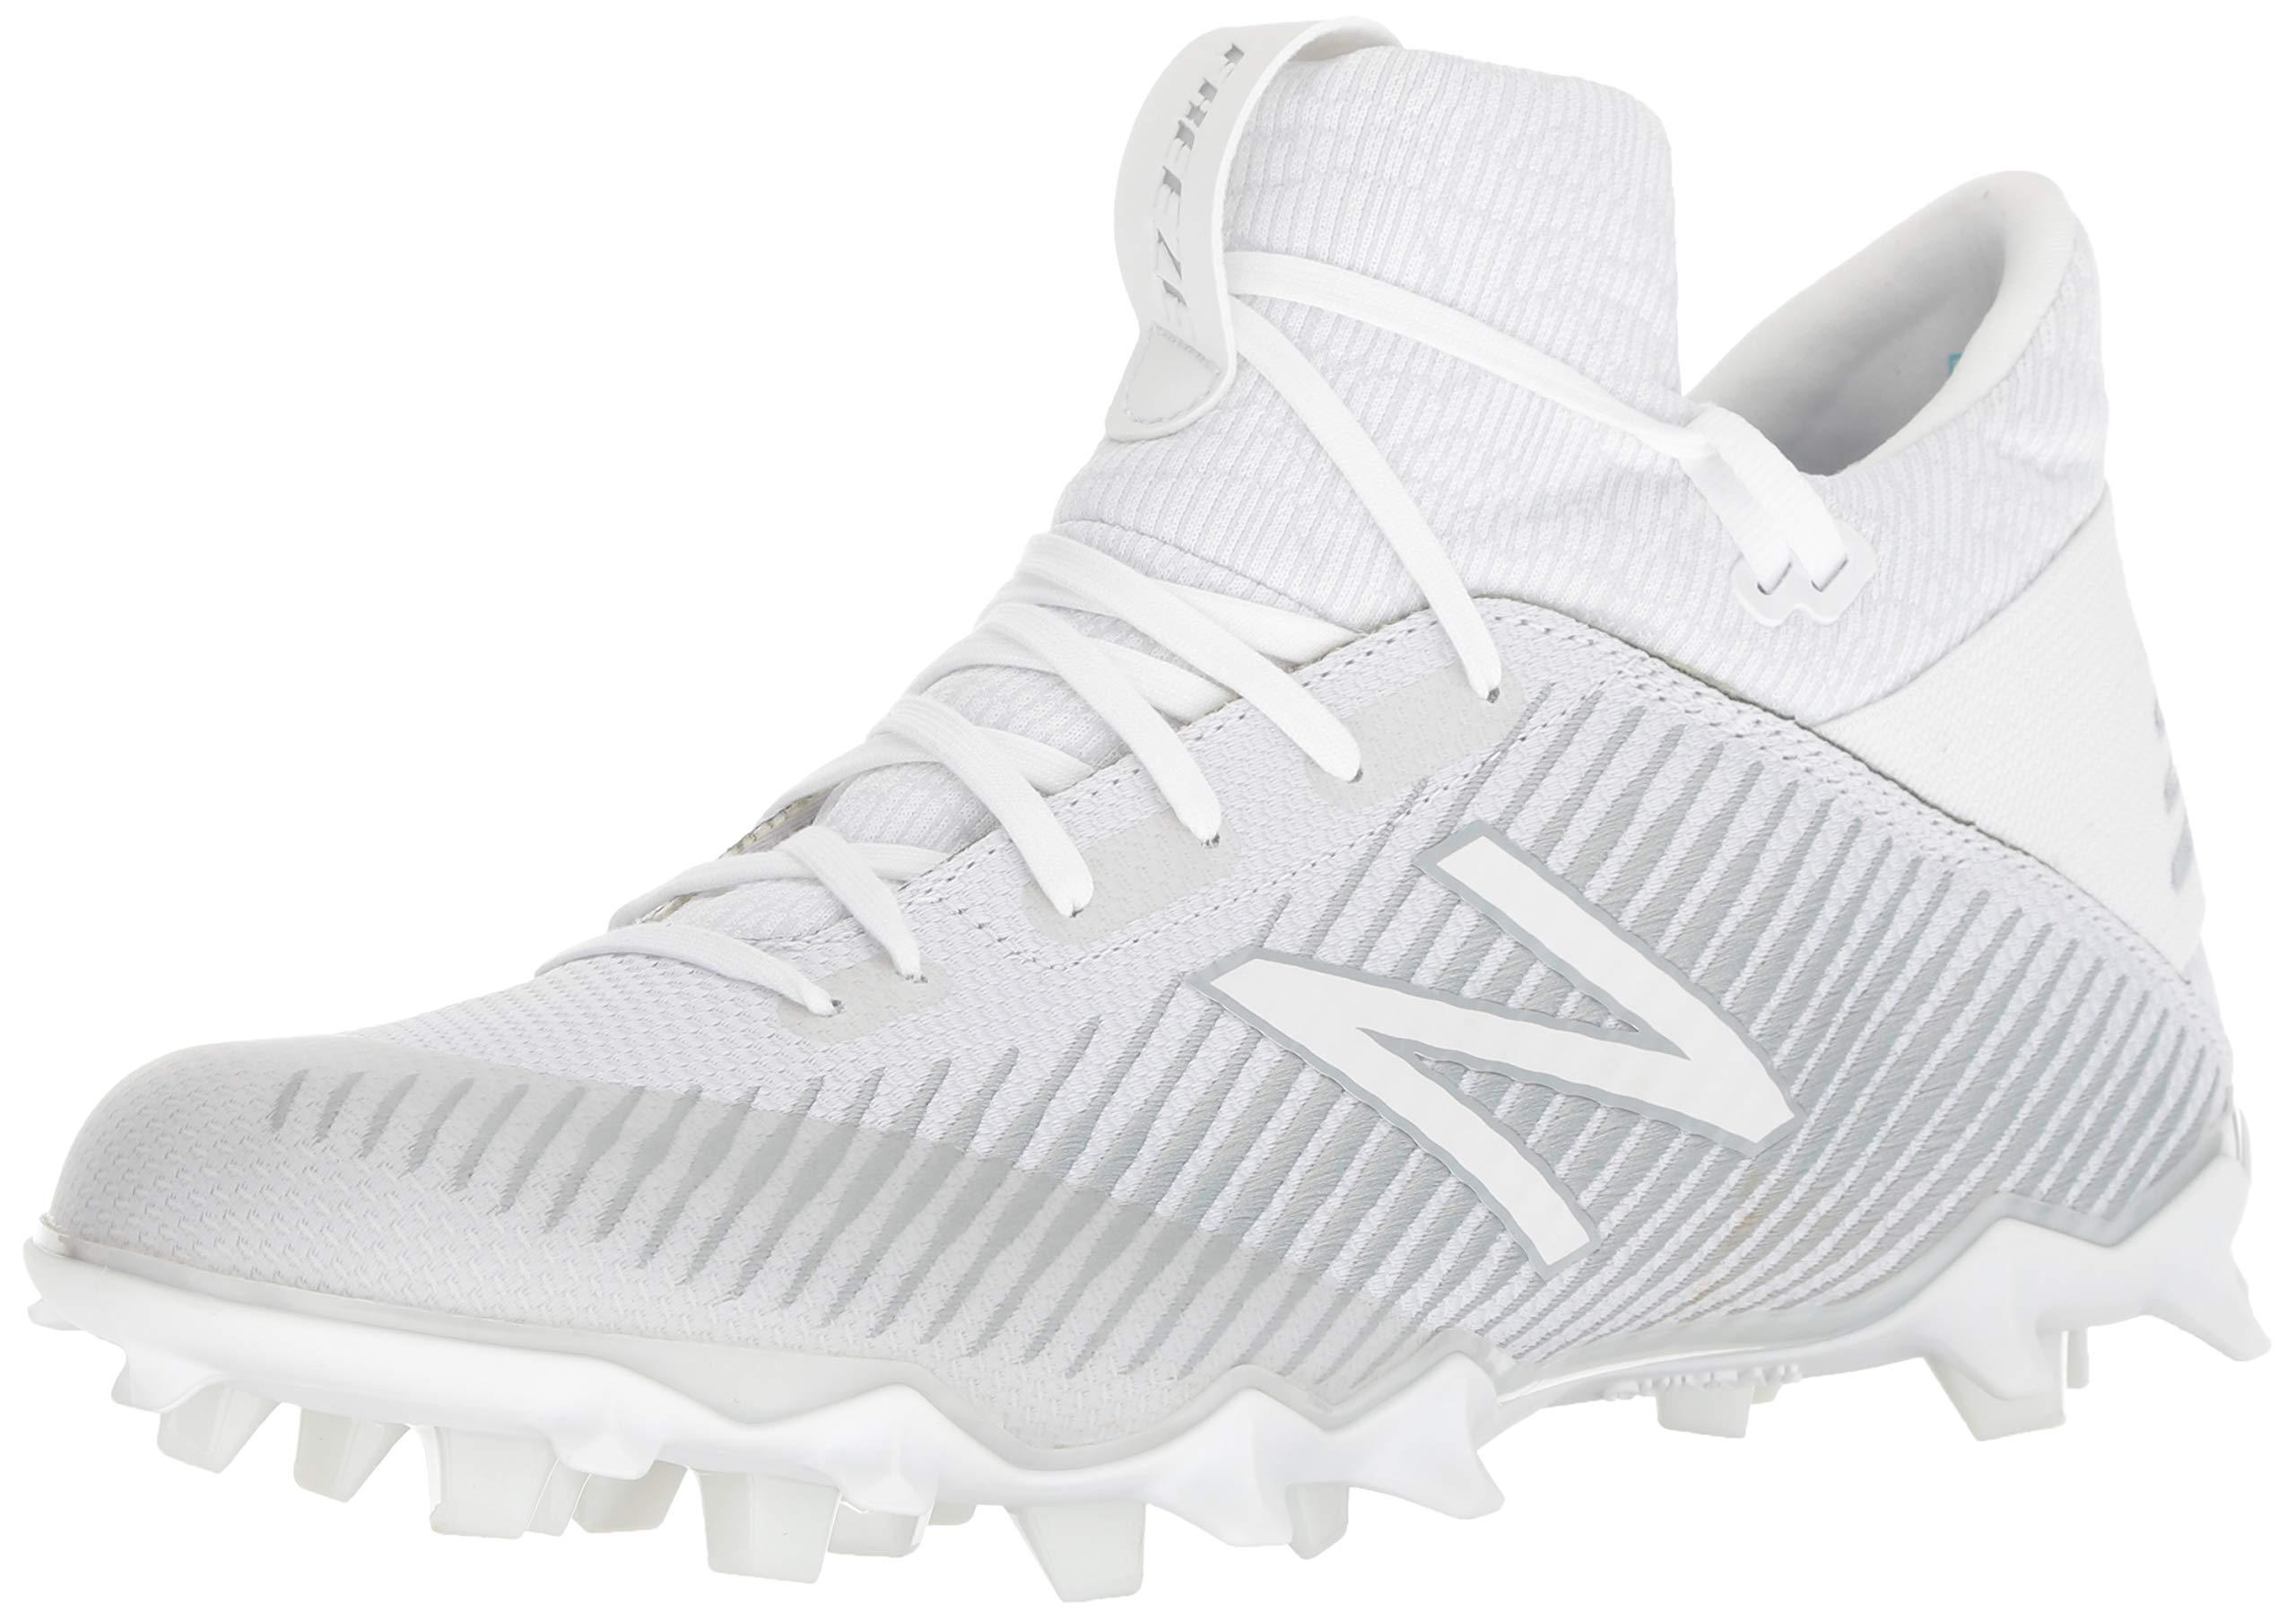 New Balance Men's Freeze V2 Agility Lacrosse Shoe, White, 6.5 D US